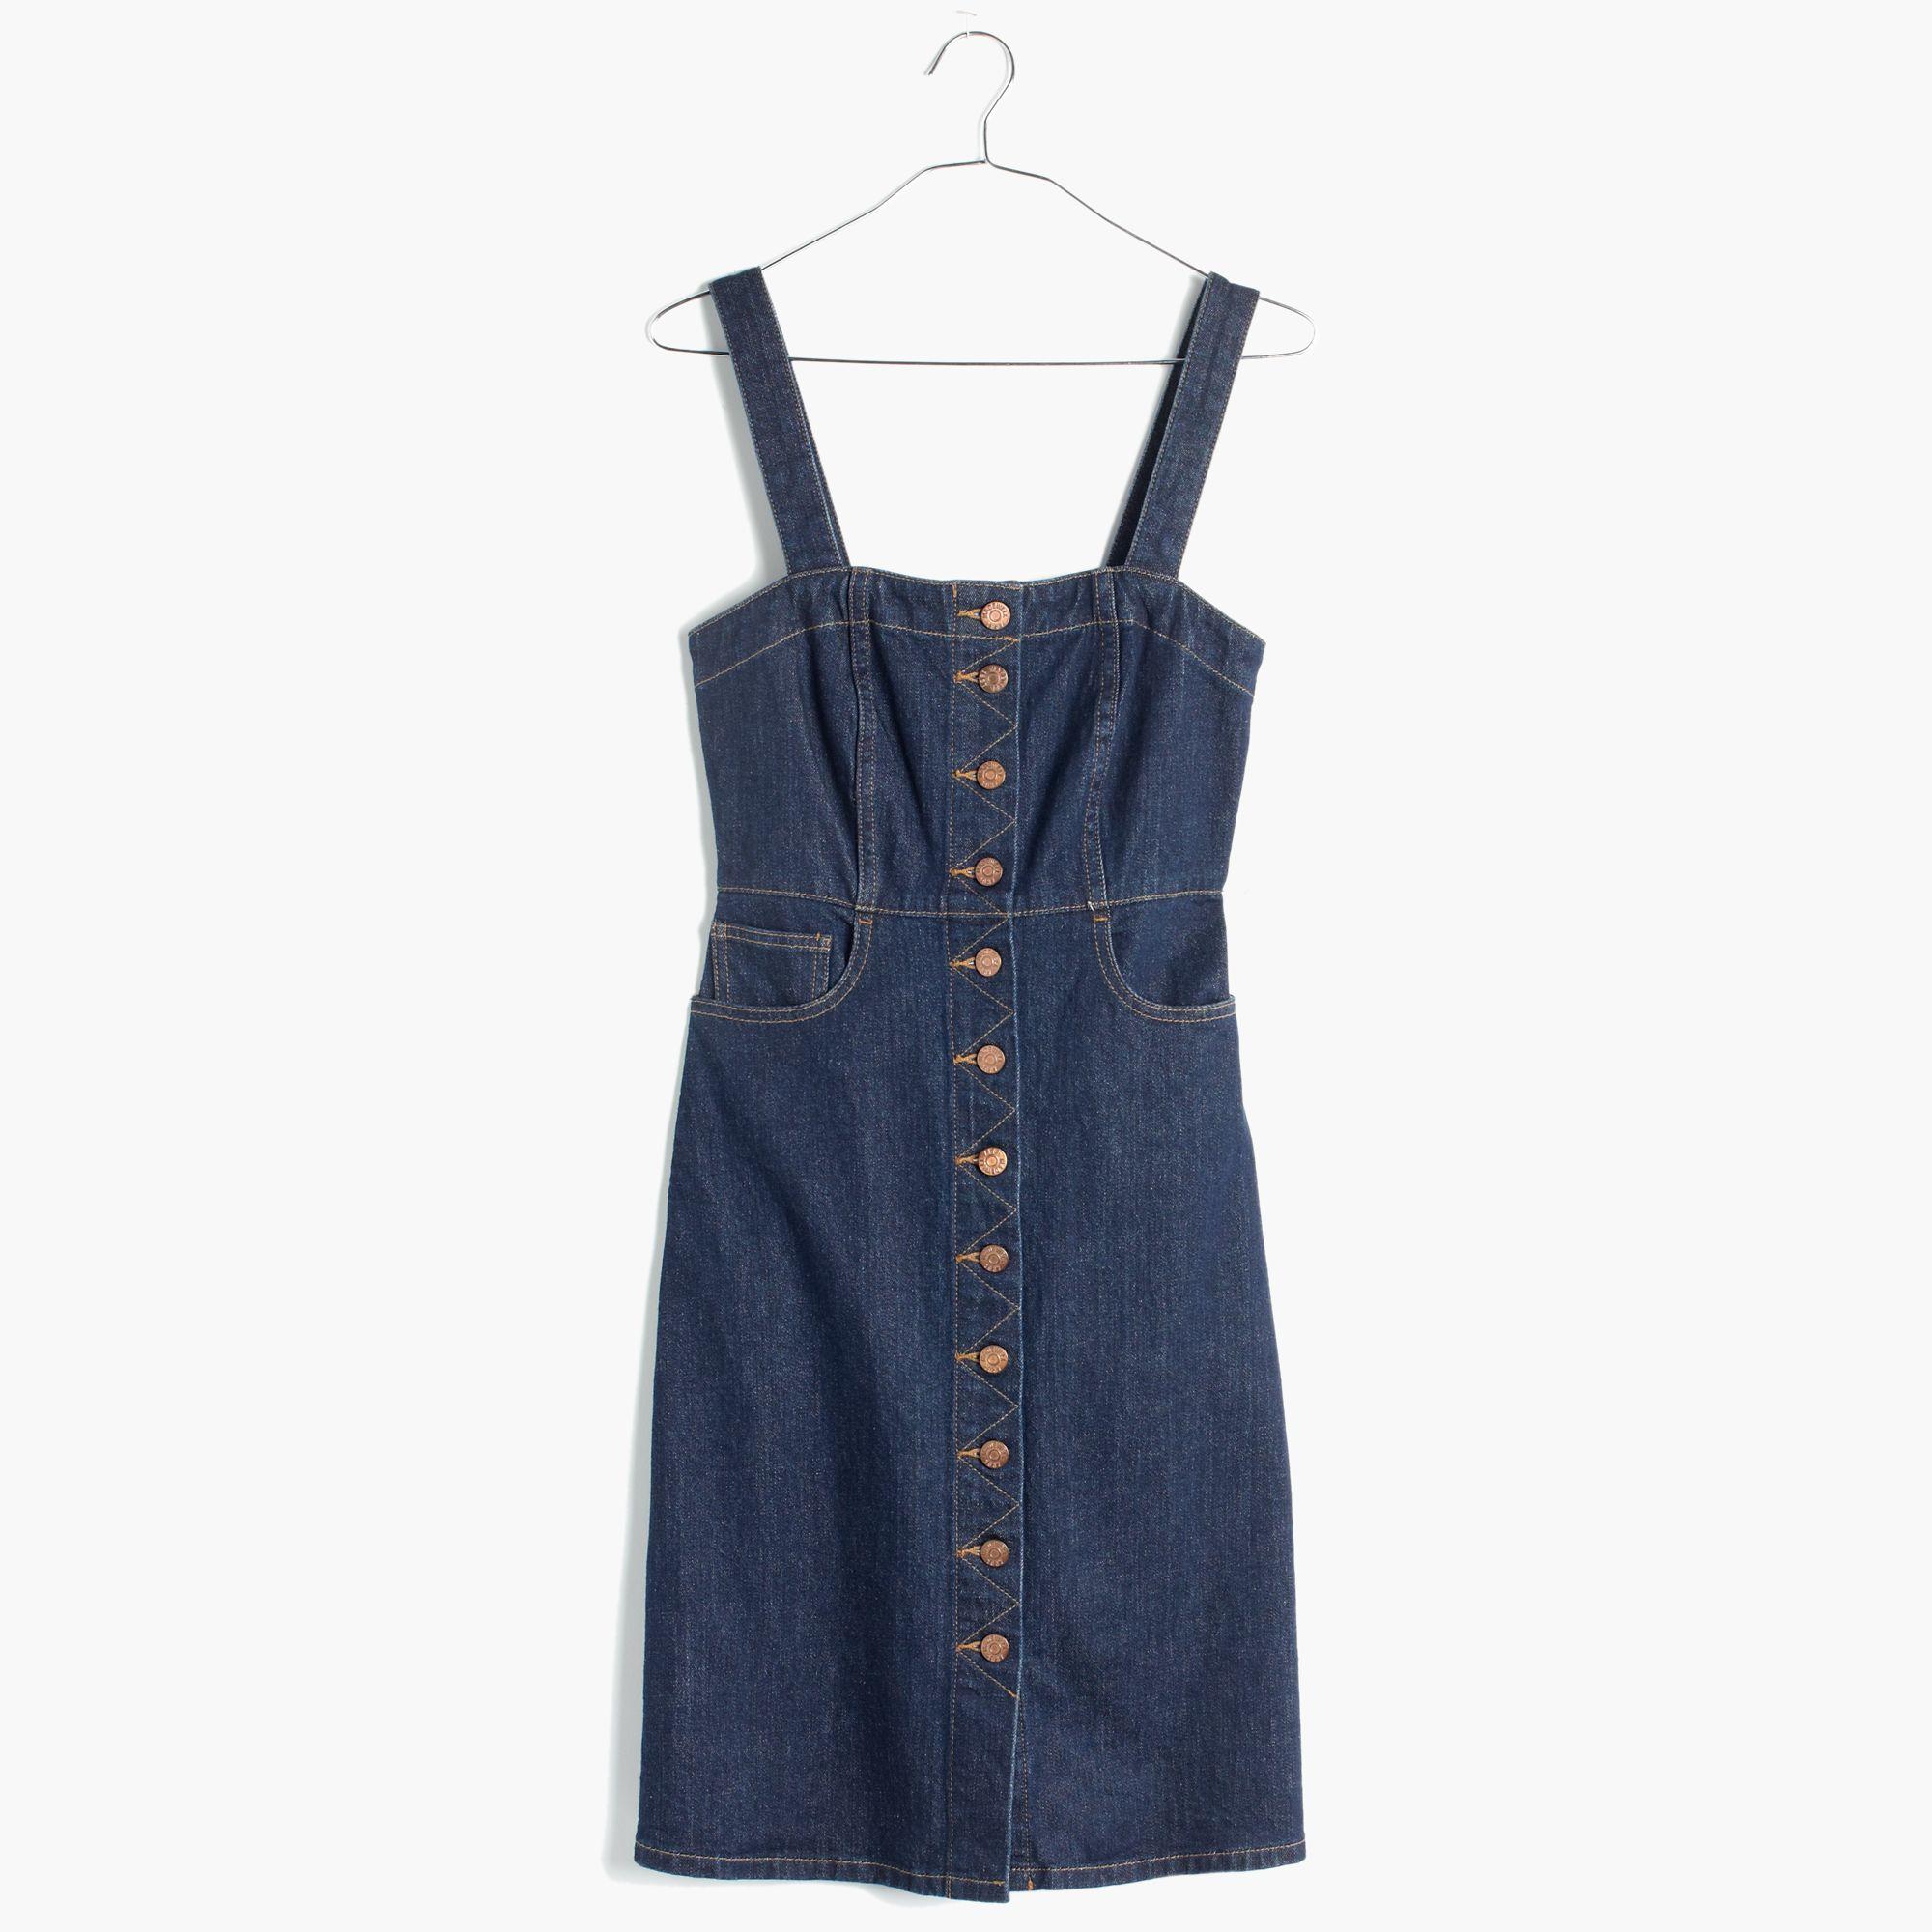 Madewell Denim Overall Dress In Matilda Wash In Blue Lyst